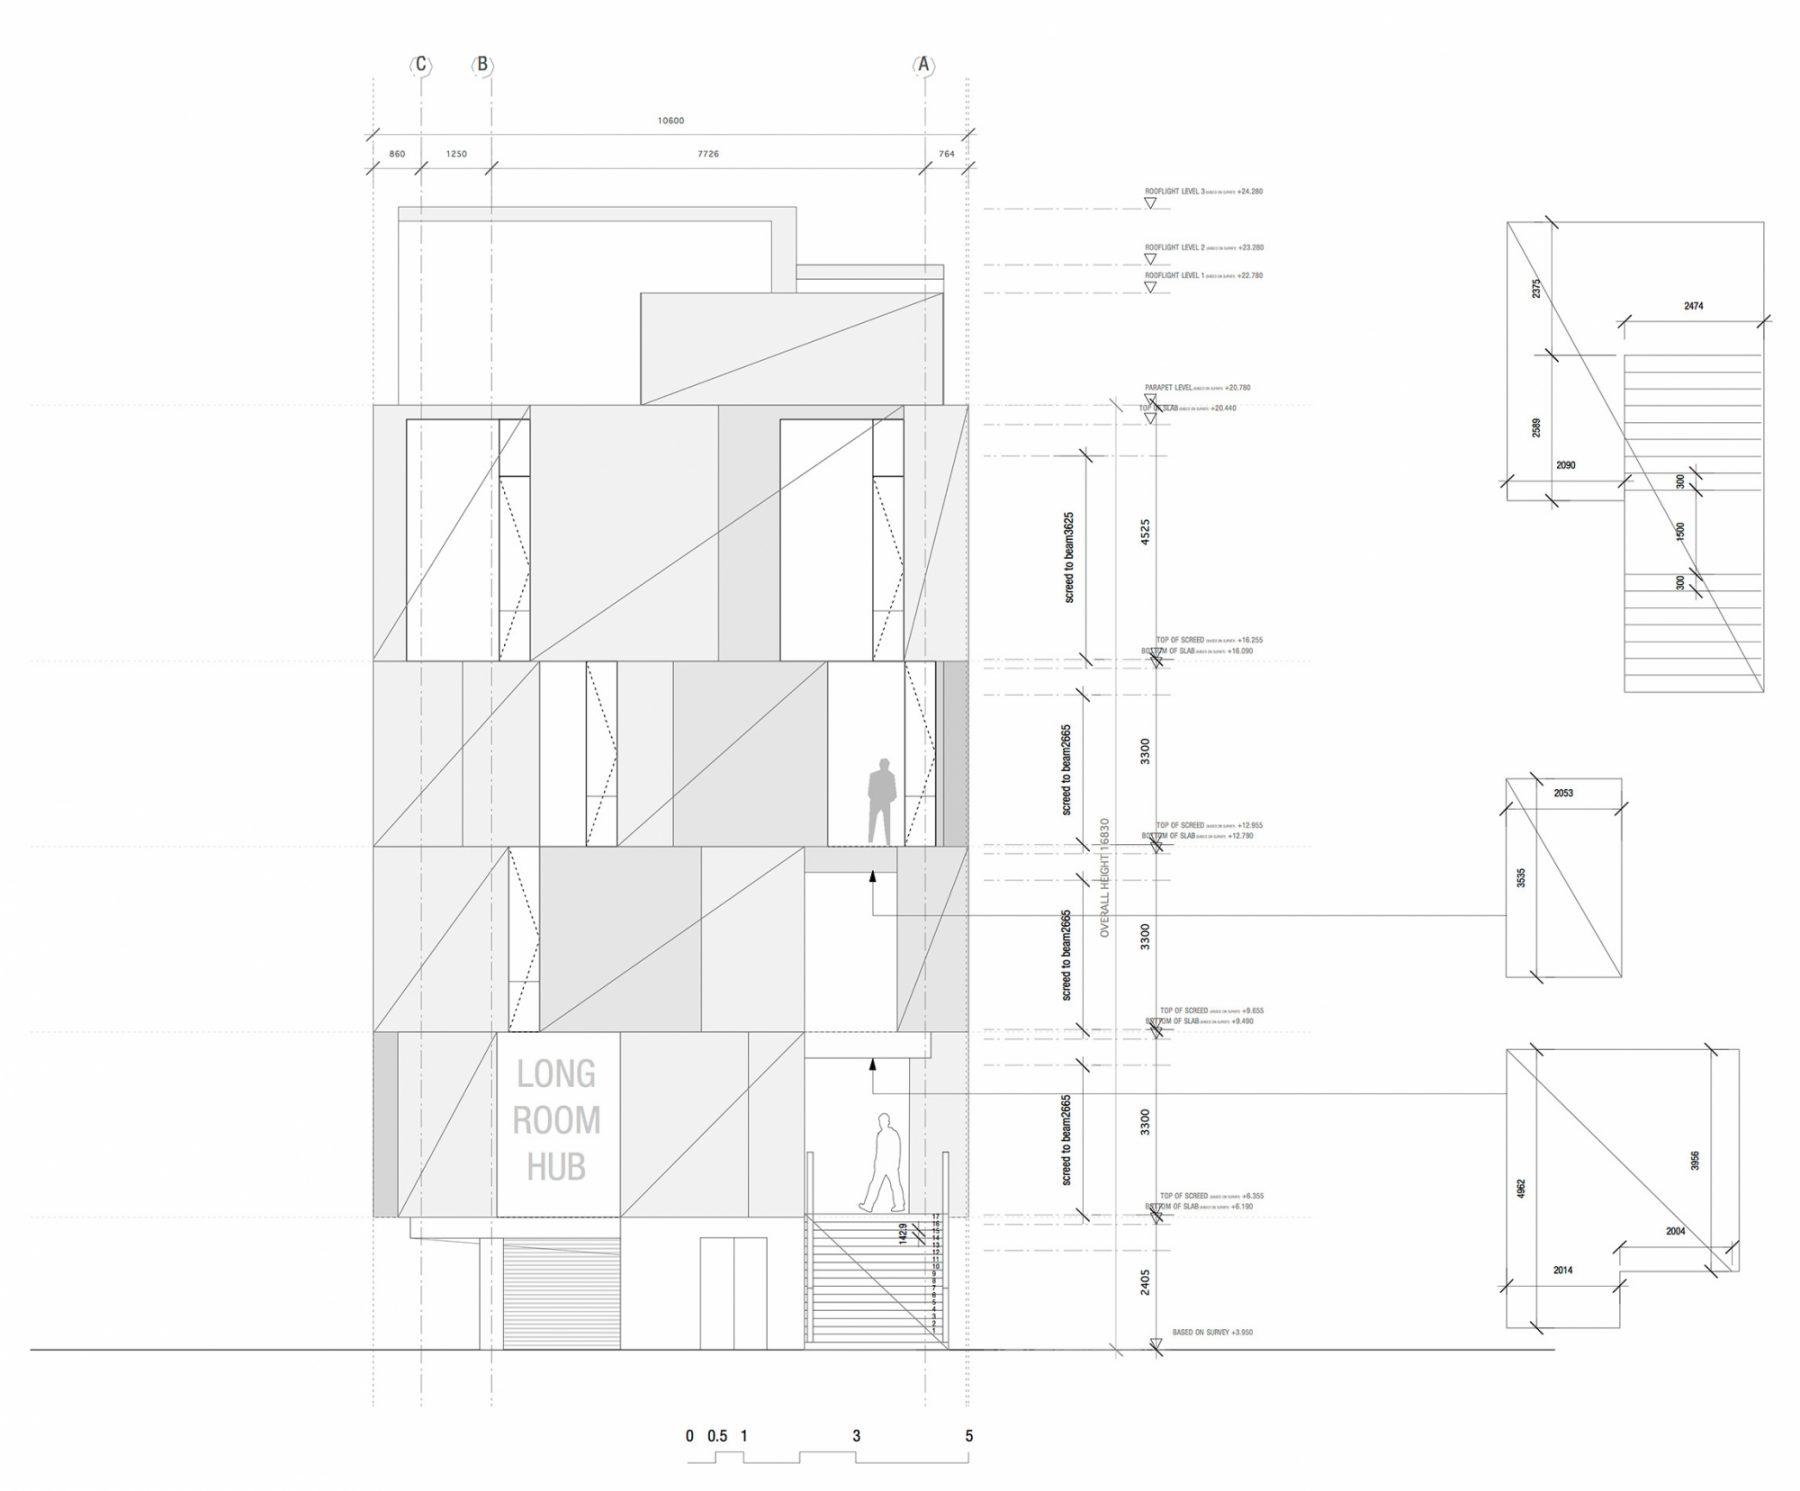 Trinity Long Room Hub — McCullough Mulvin